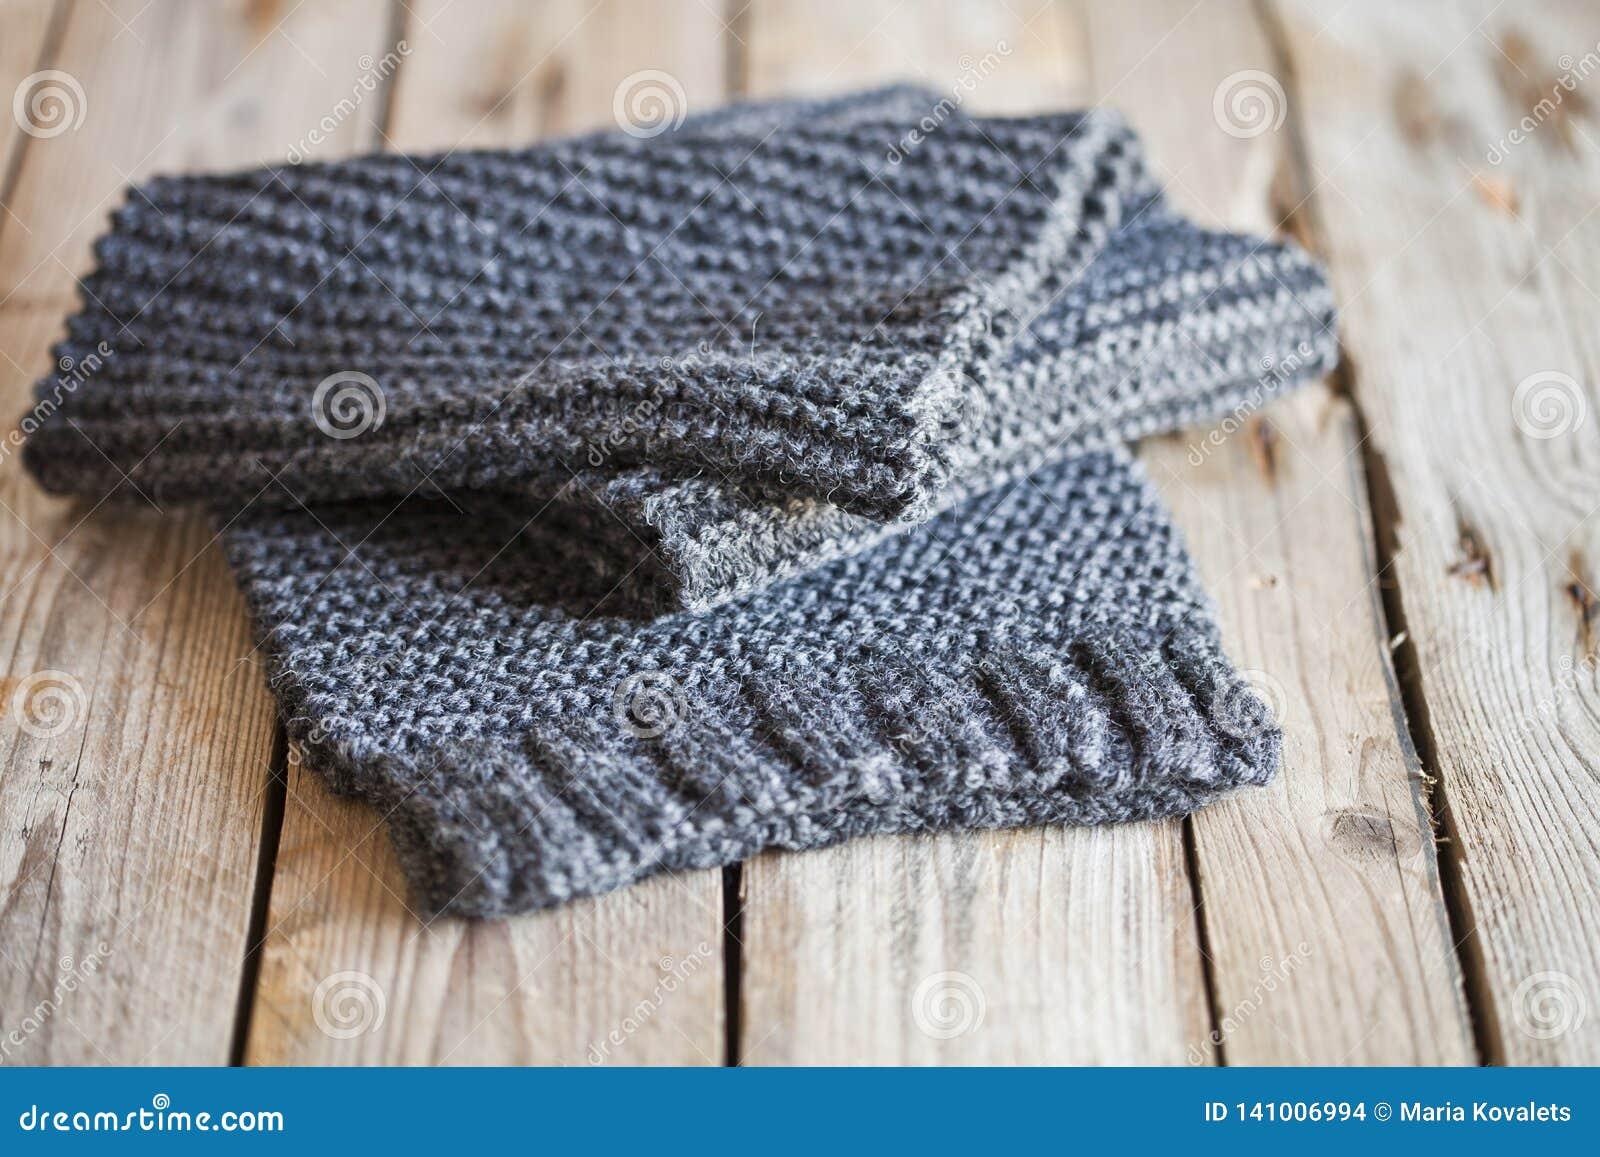 Knitted dark grey scarf